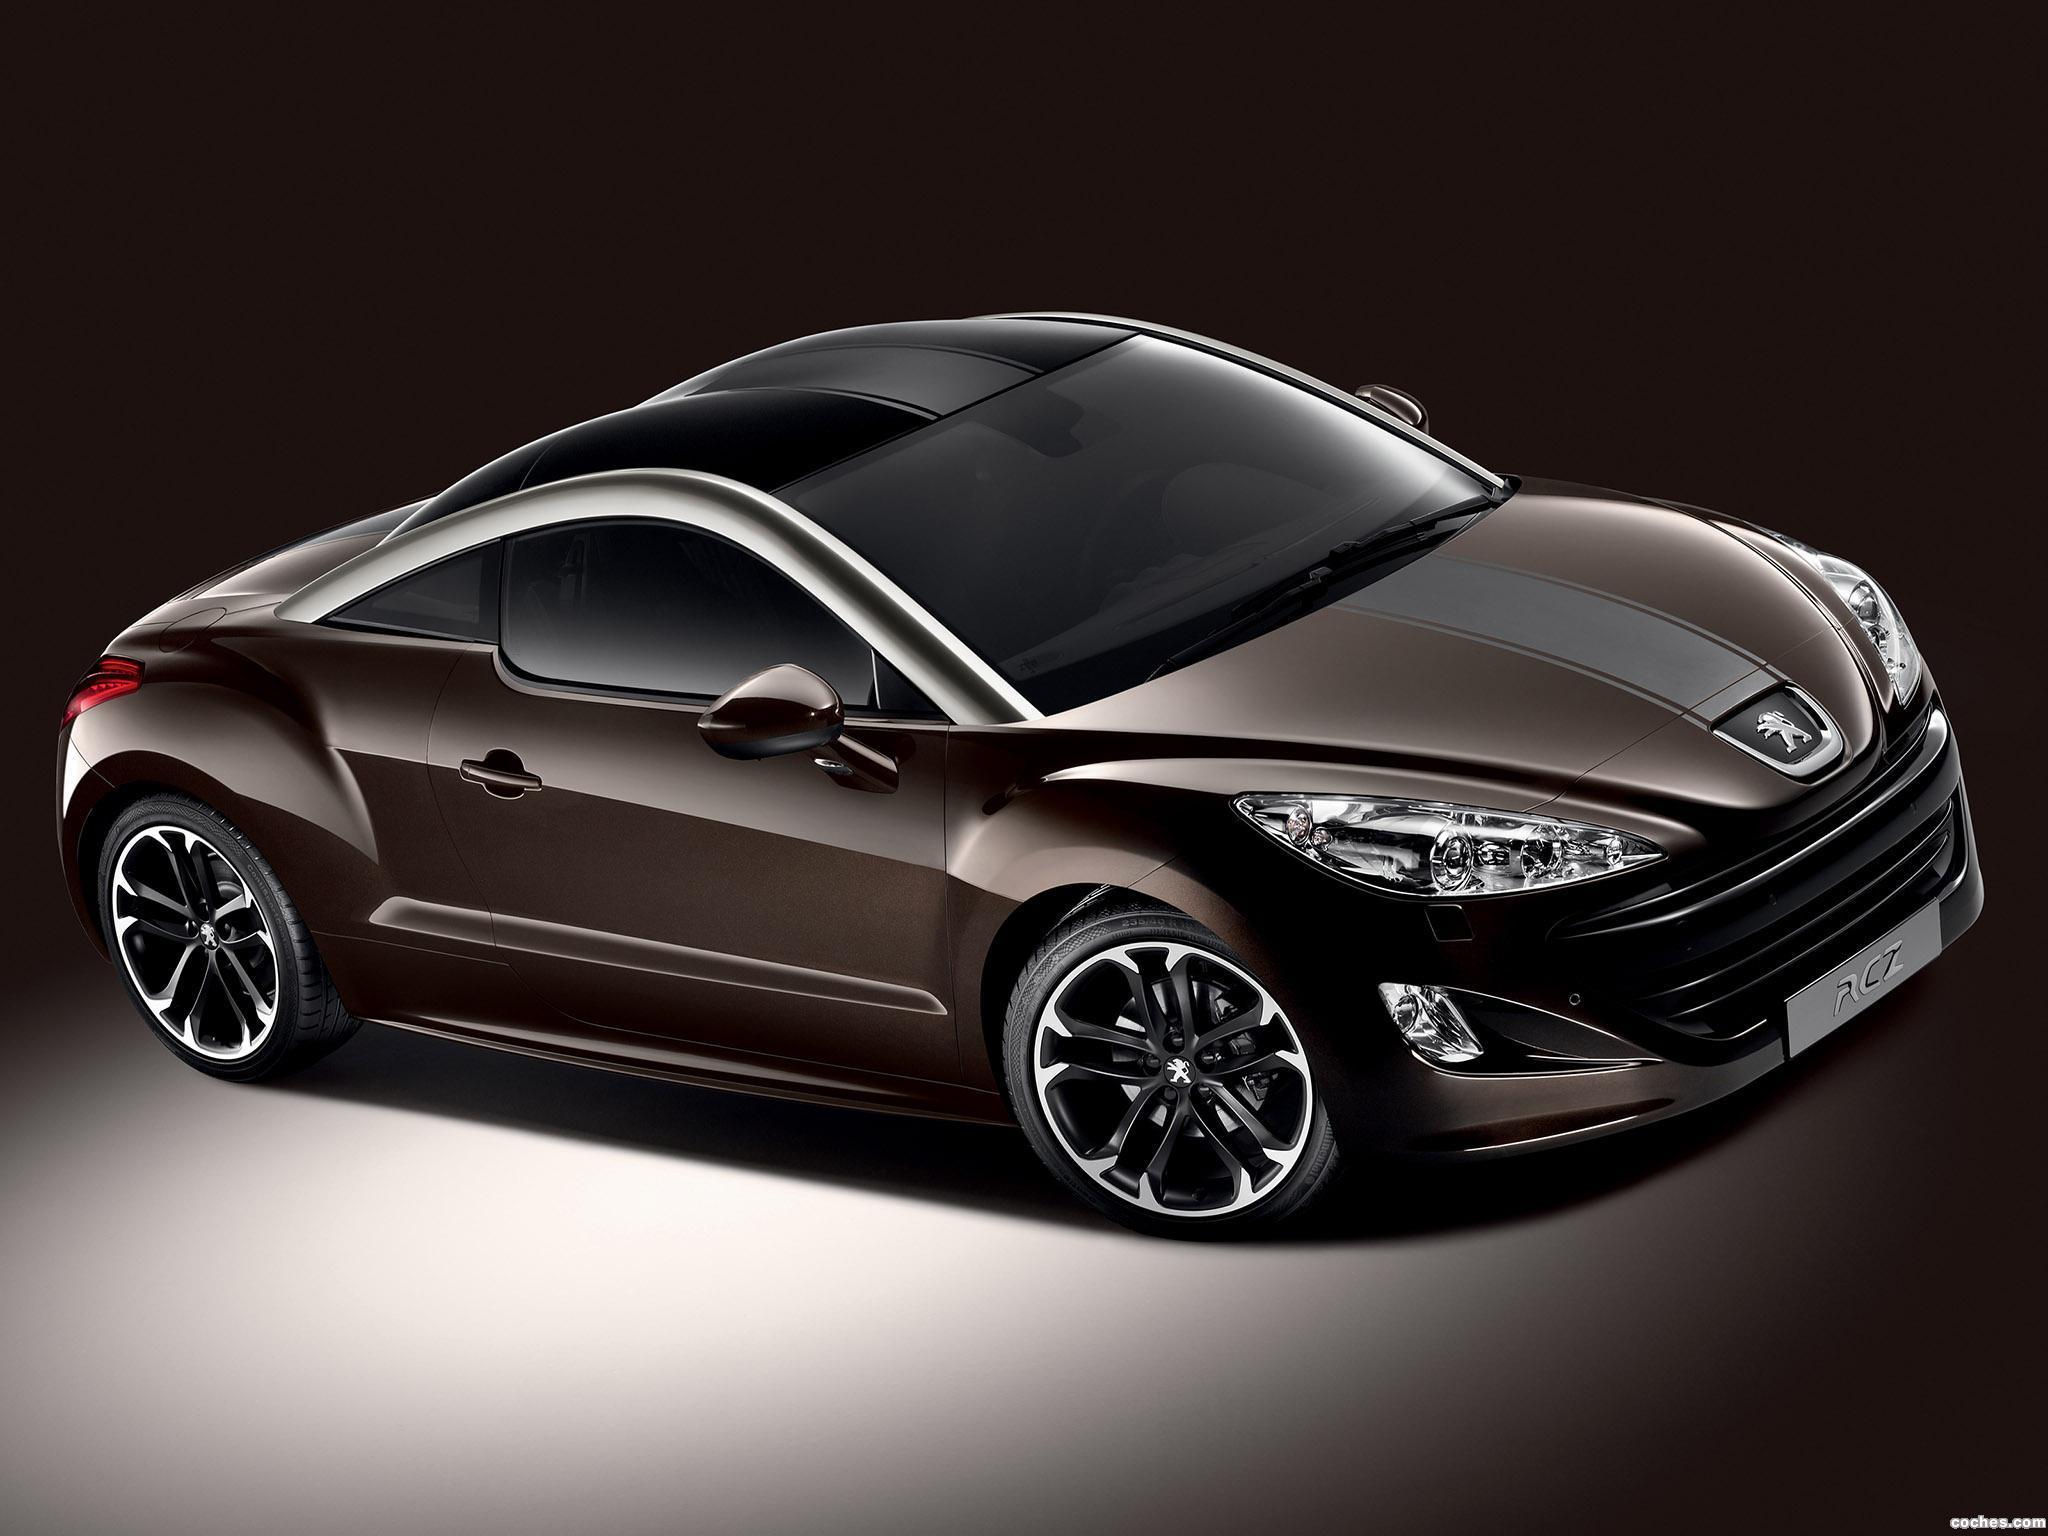 Foto 0 de Peugeot RCZ Brownstone 2012